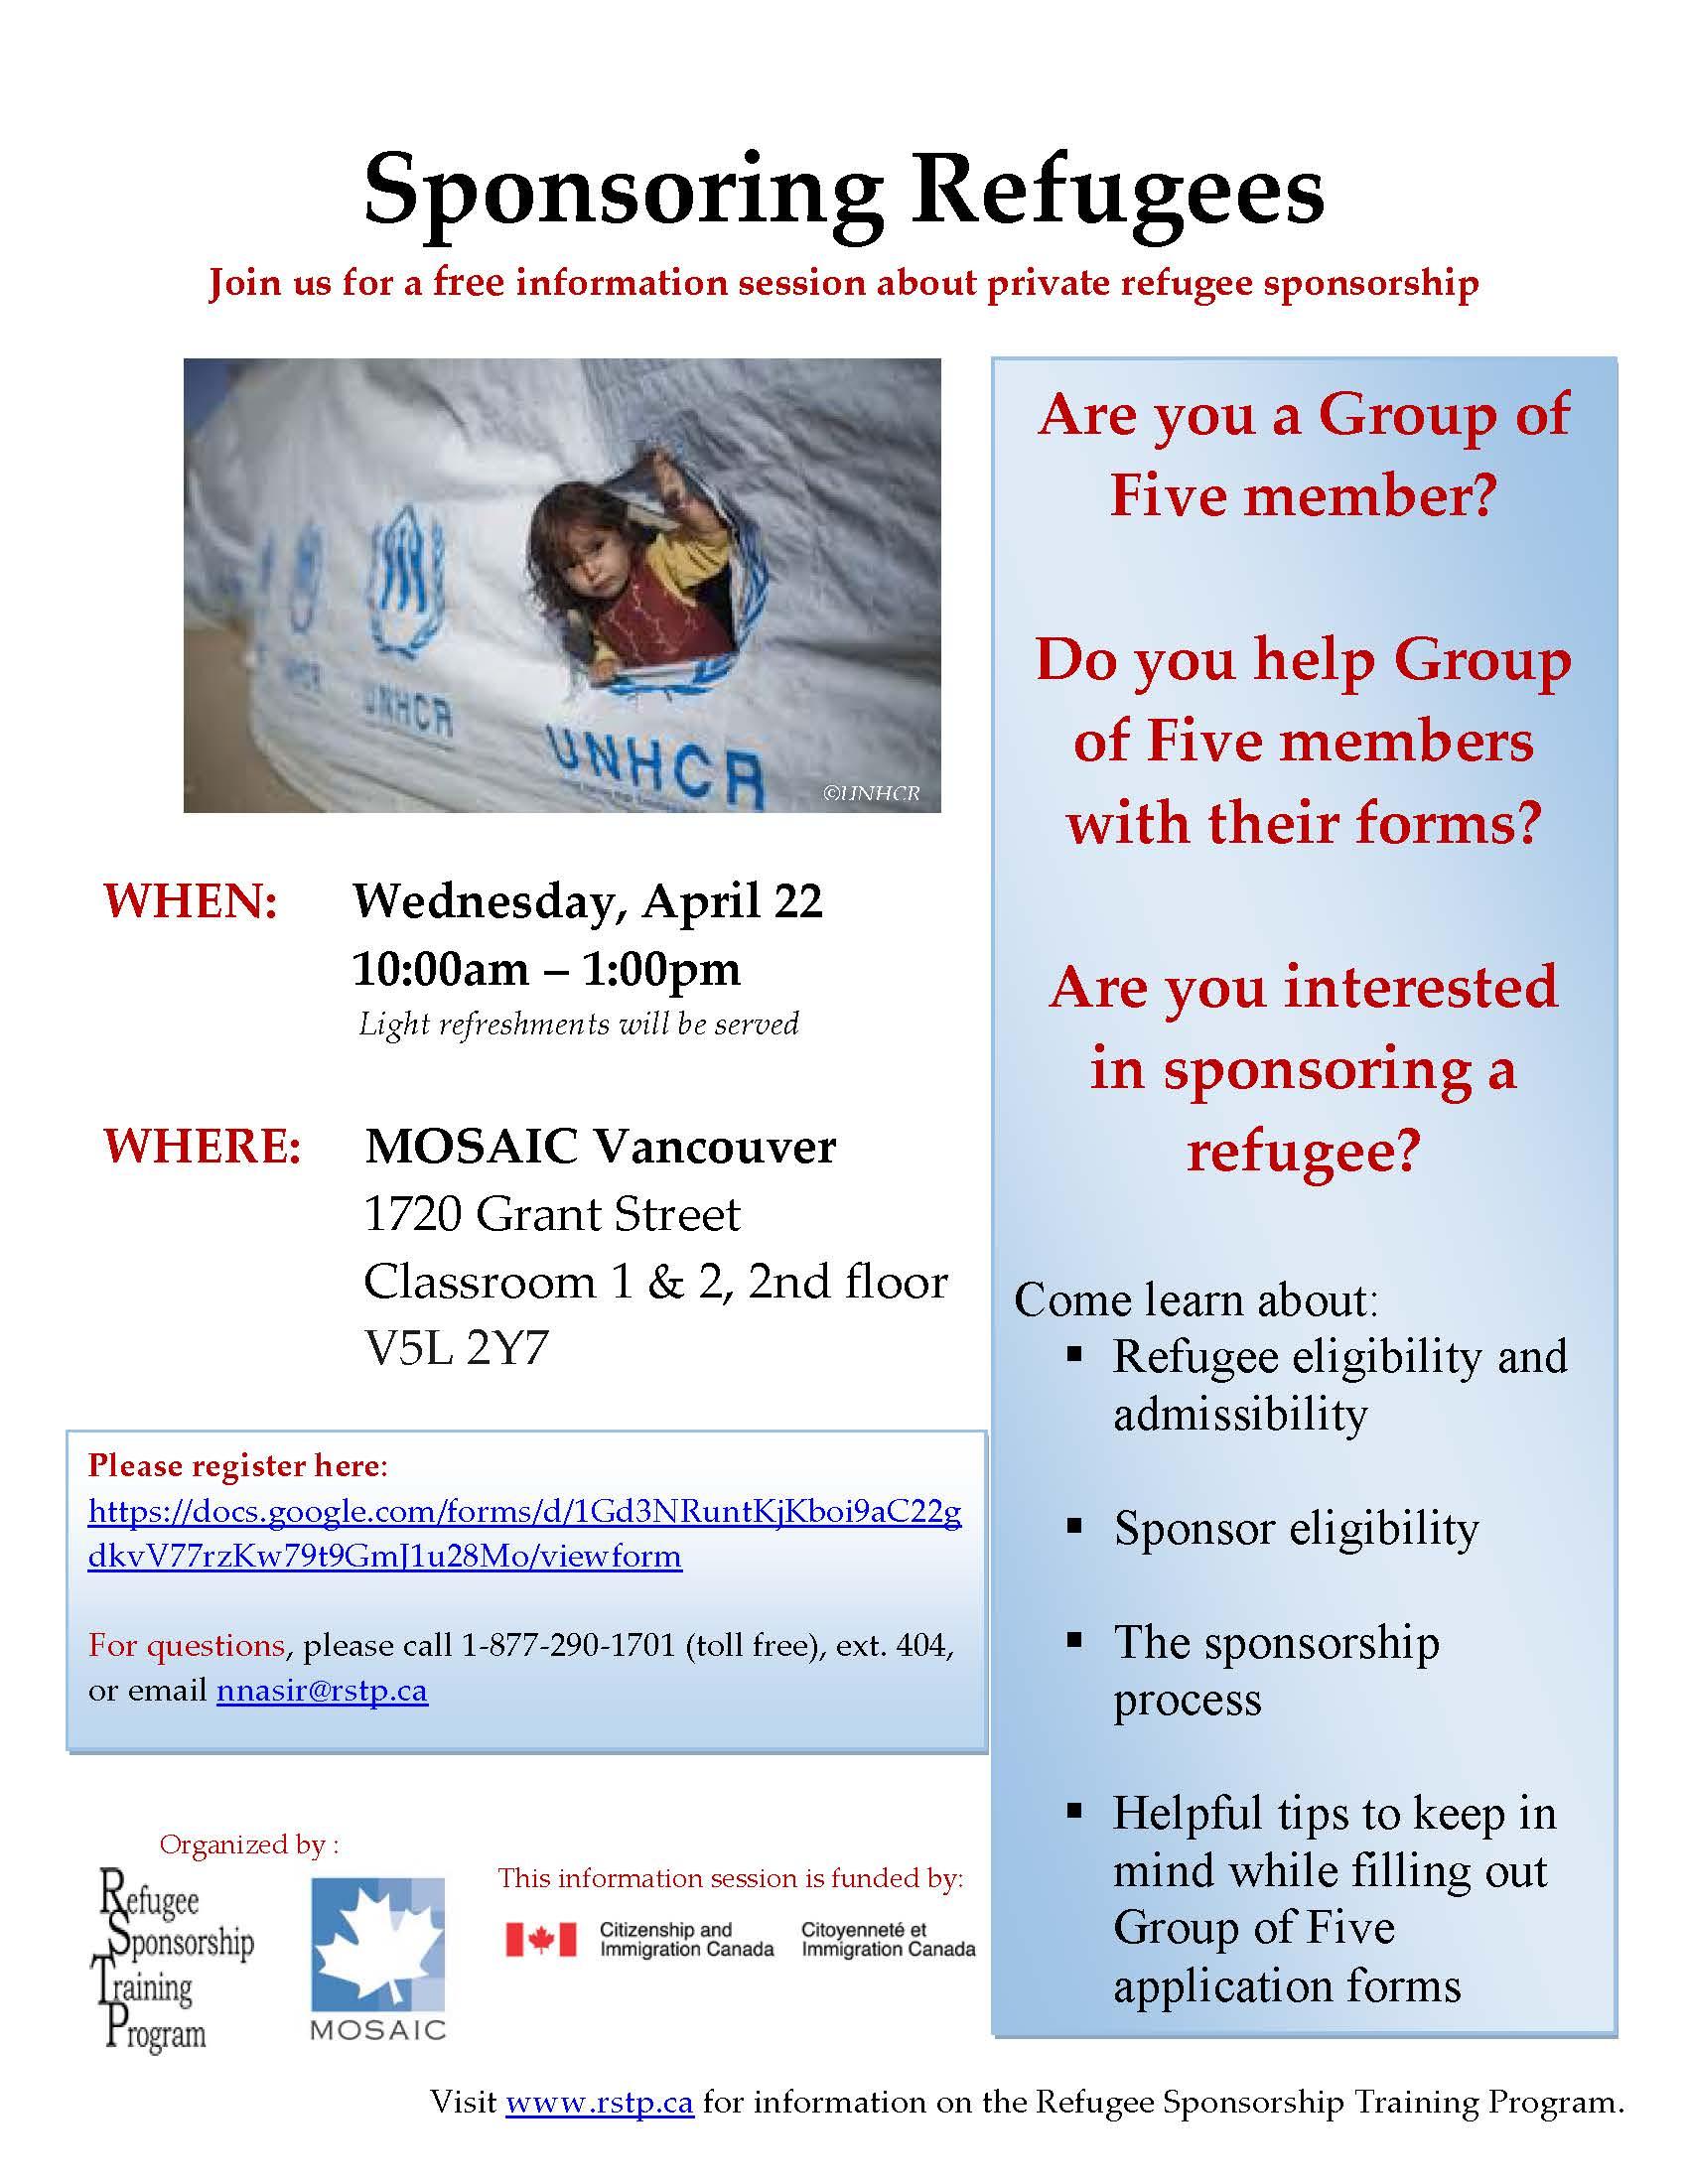 Group of Five Sponsorship - April 22 2015 - Vancouver